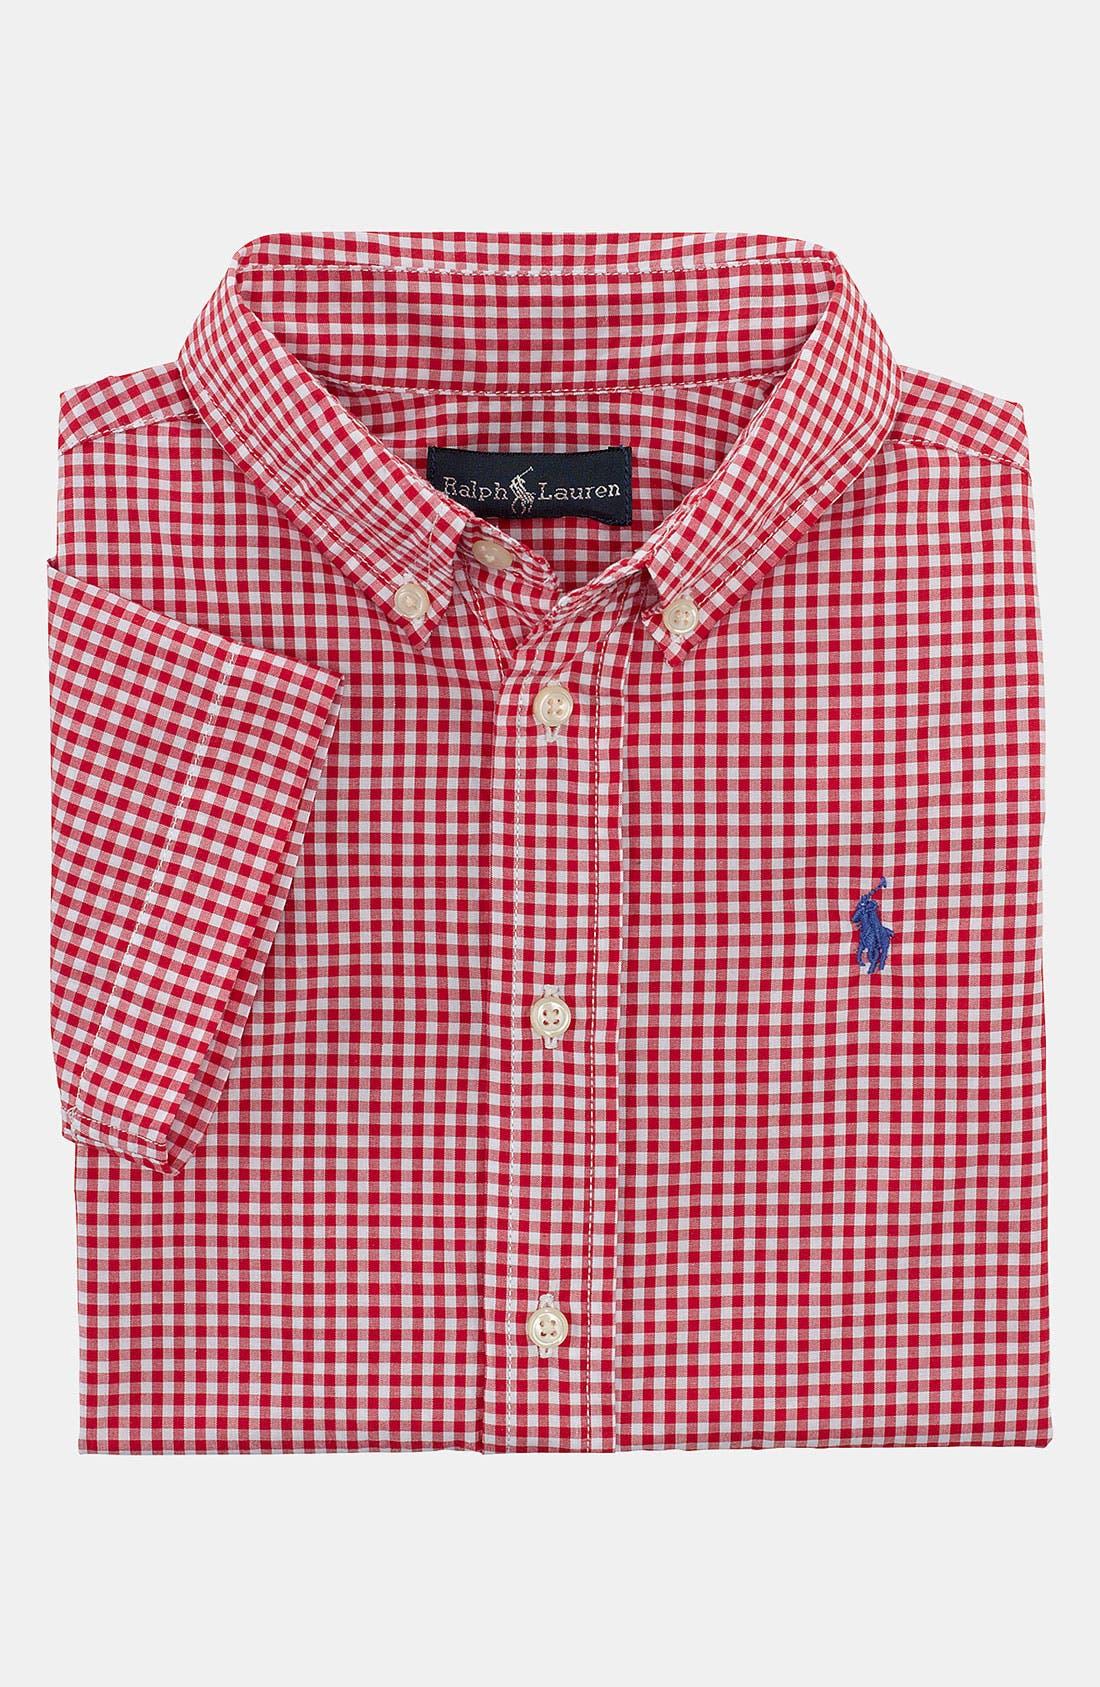 Alternate Image 1 Selected - Ralph Lauren Gingham Shirt (Toddler)